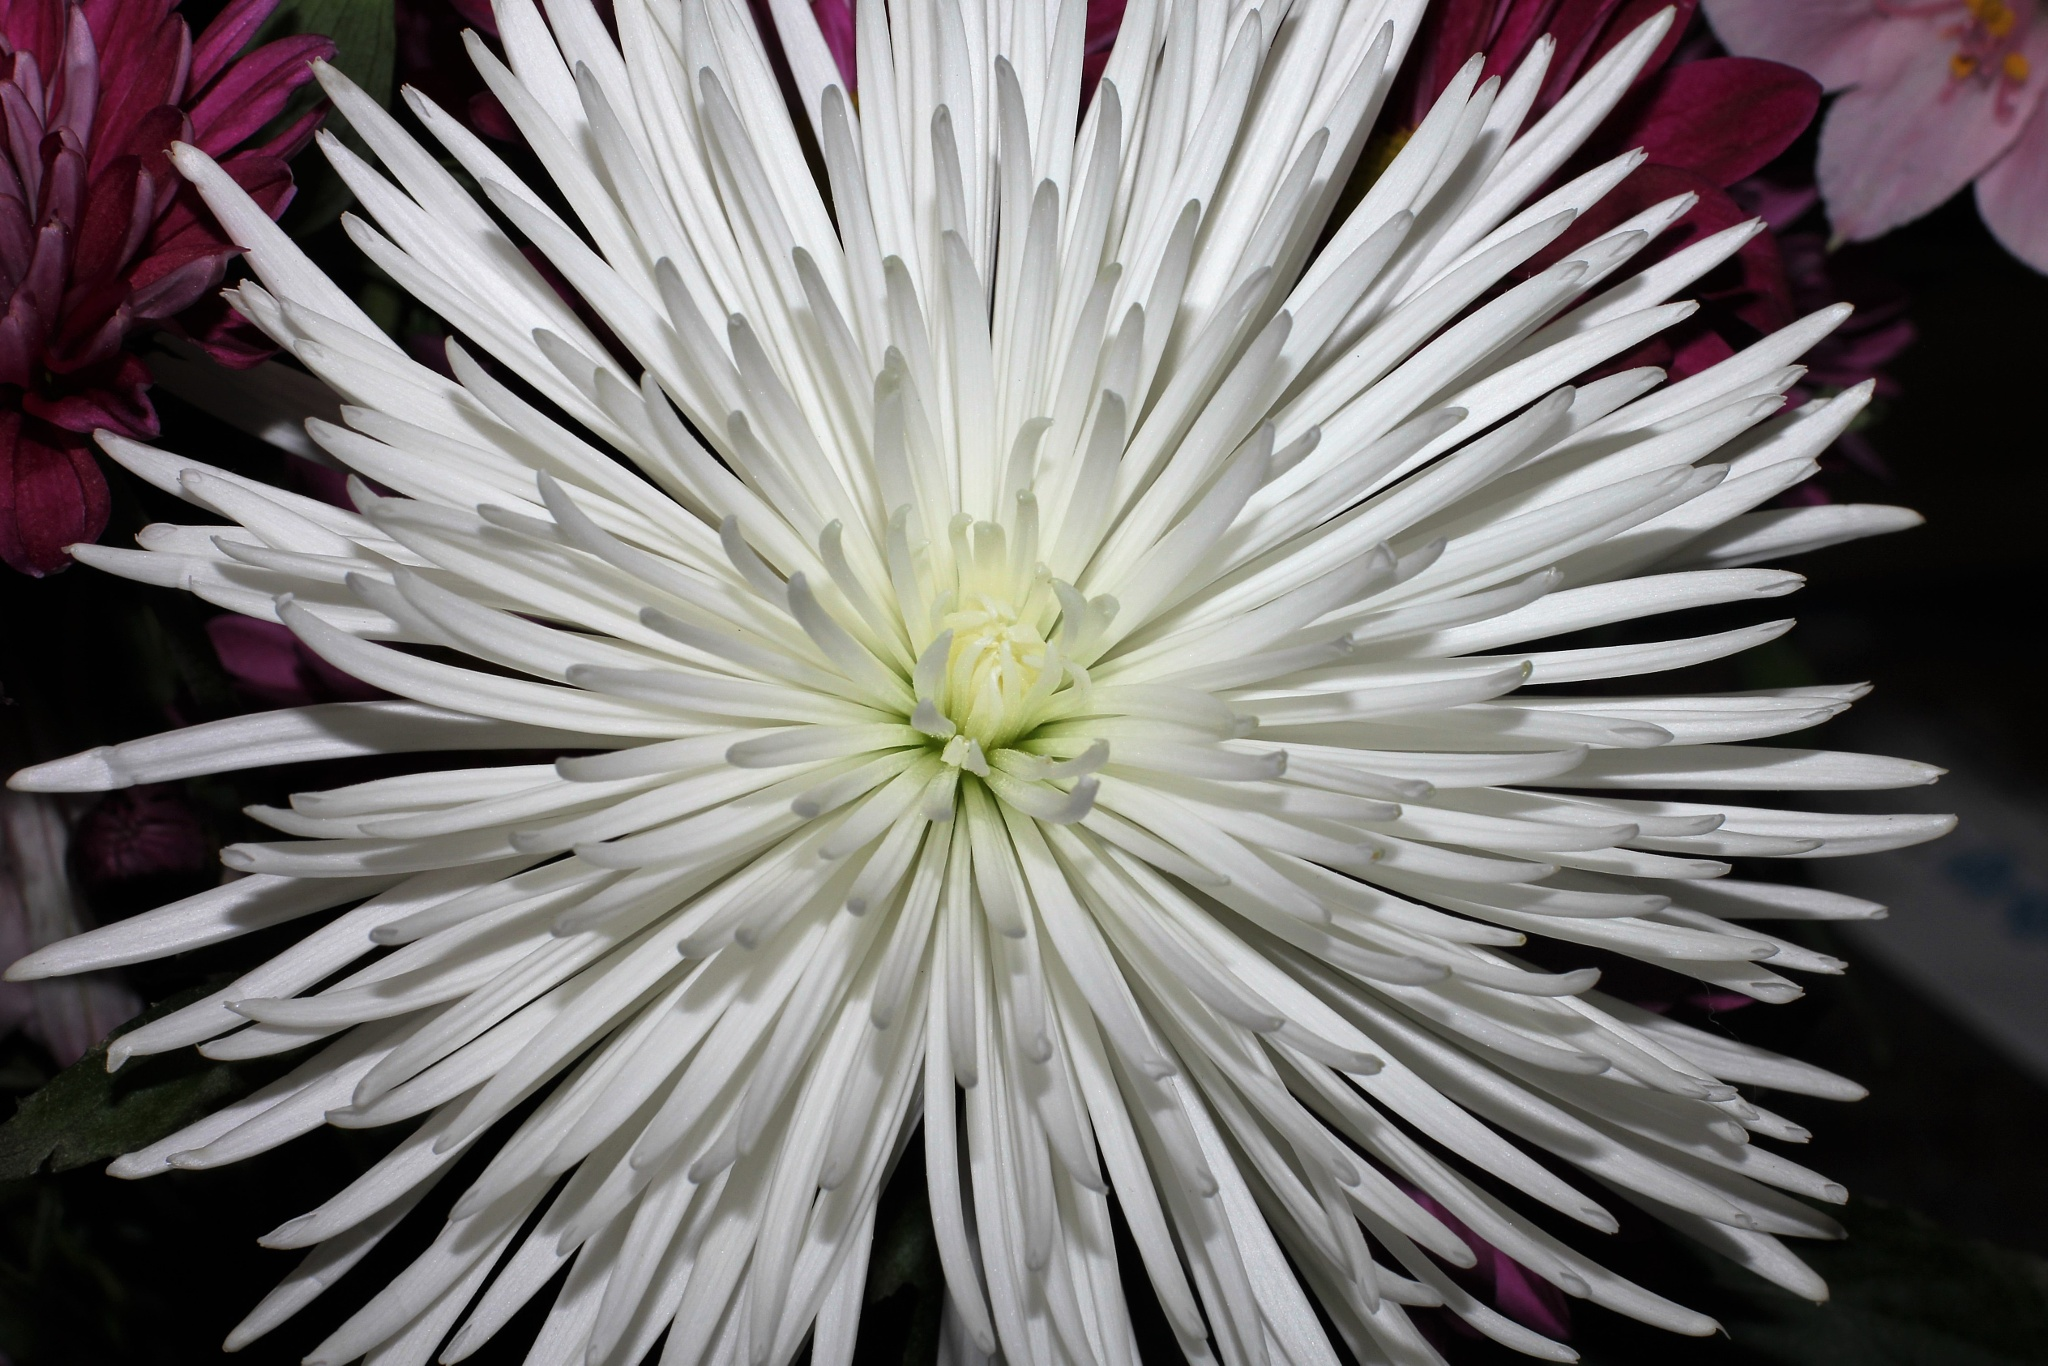 Flower Burst by carolyn.johnnyalcina